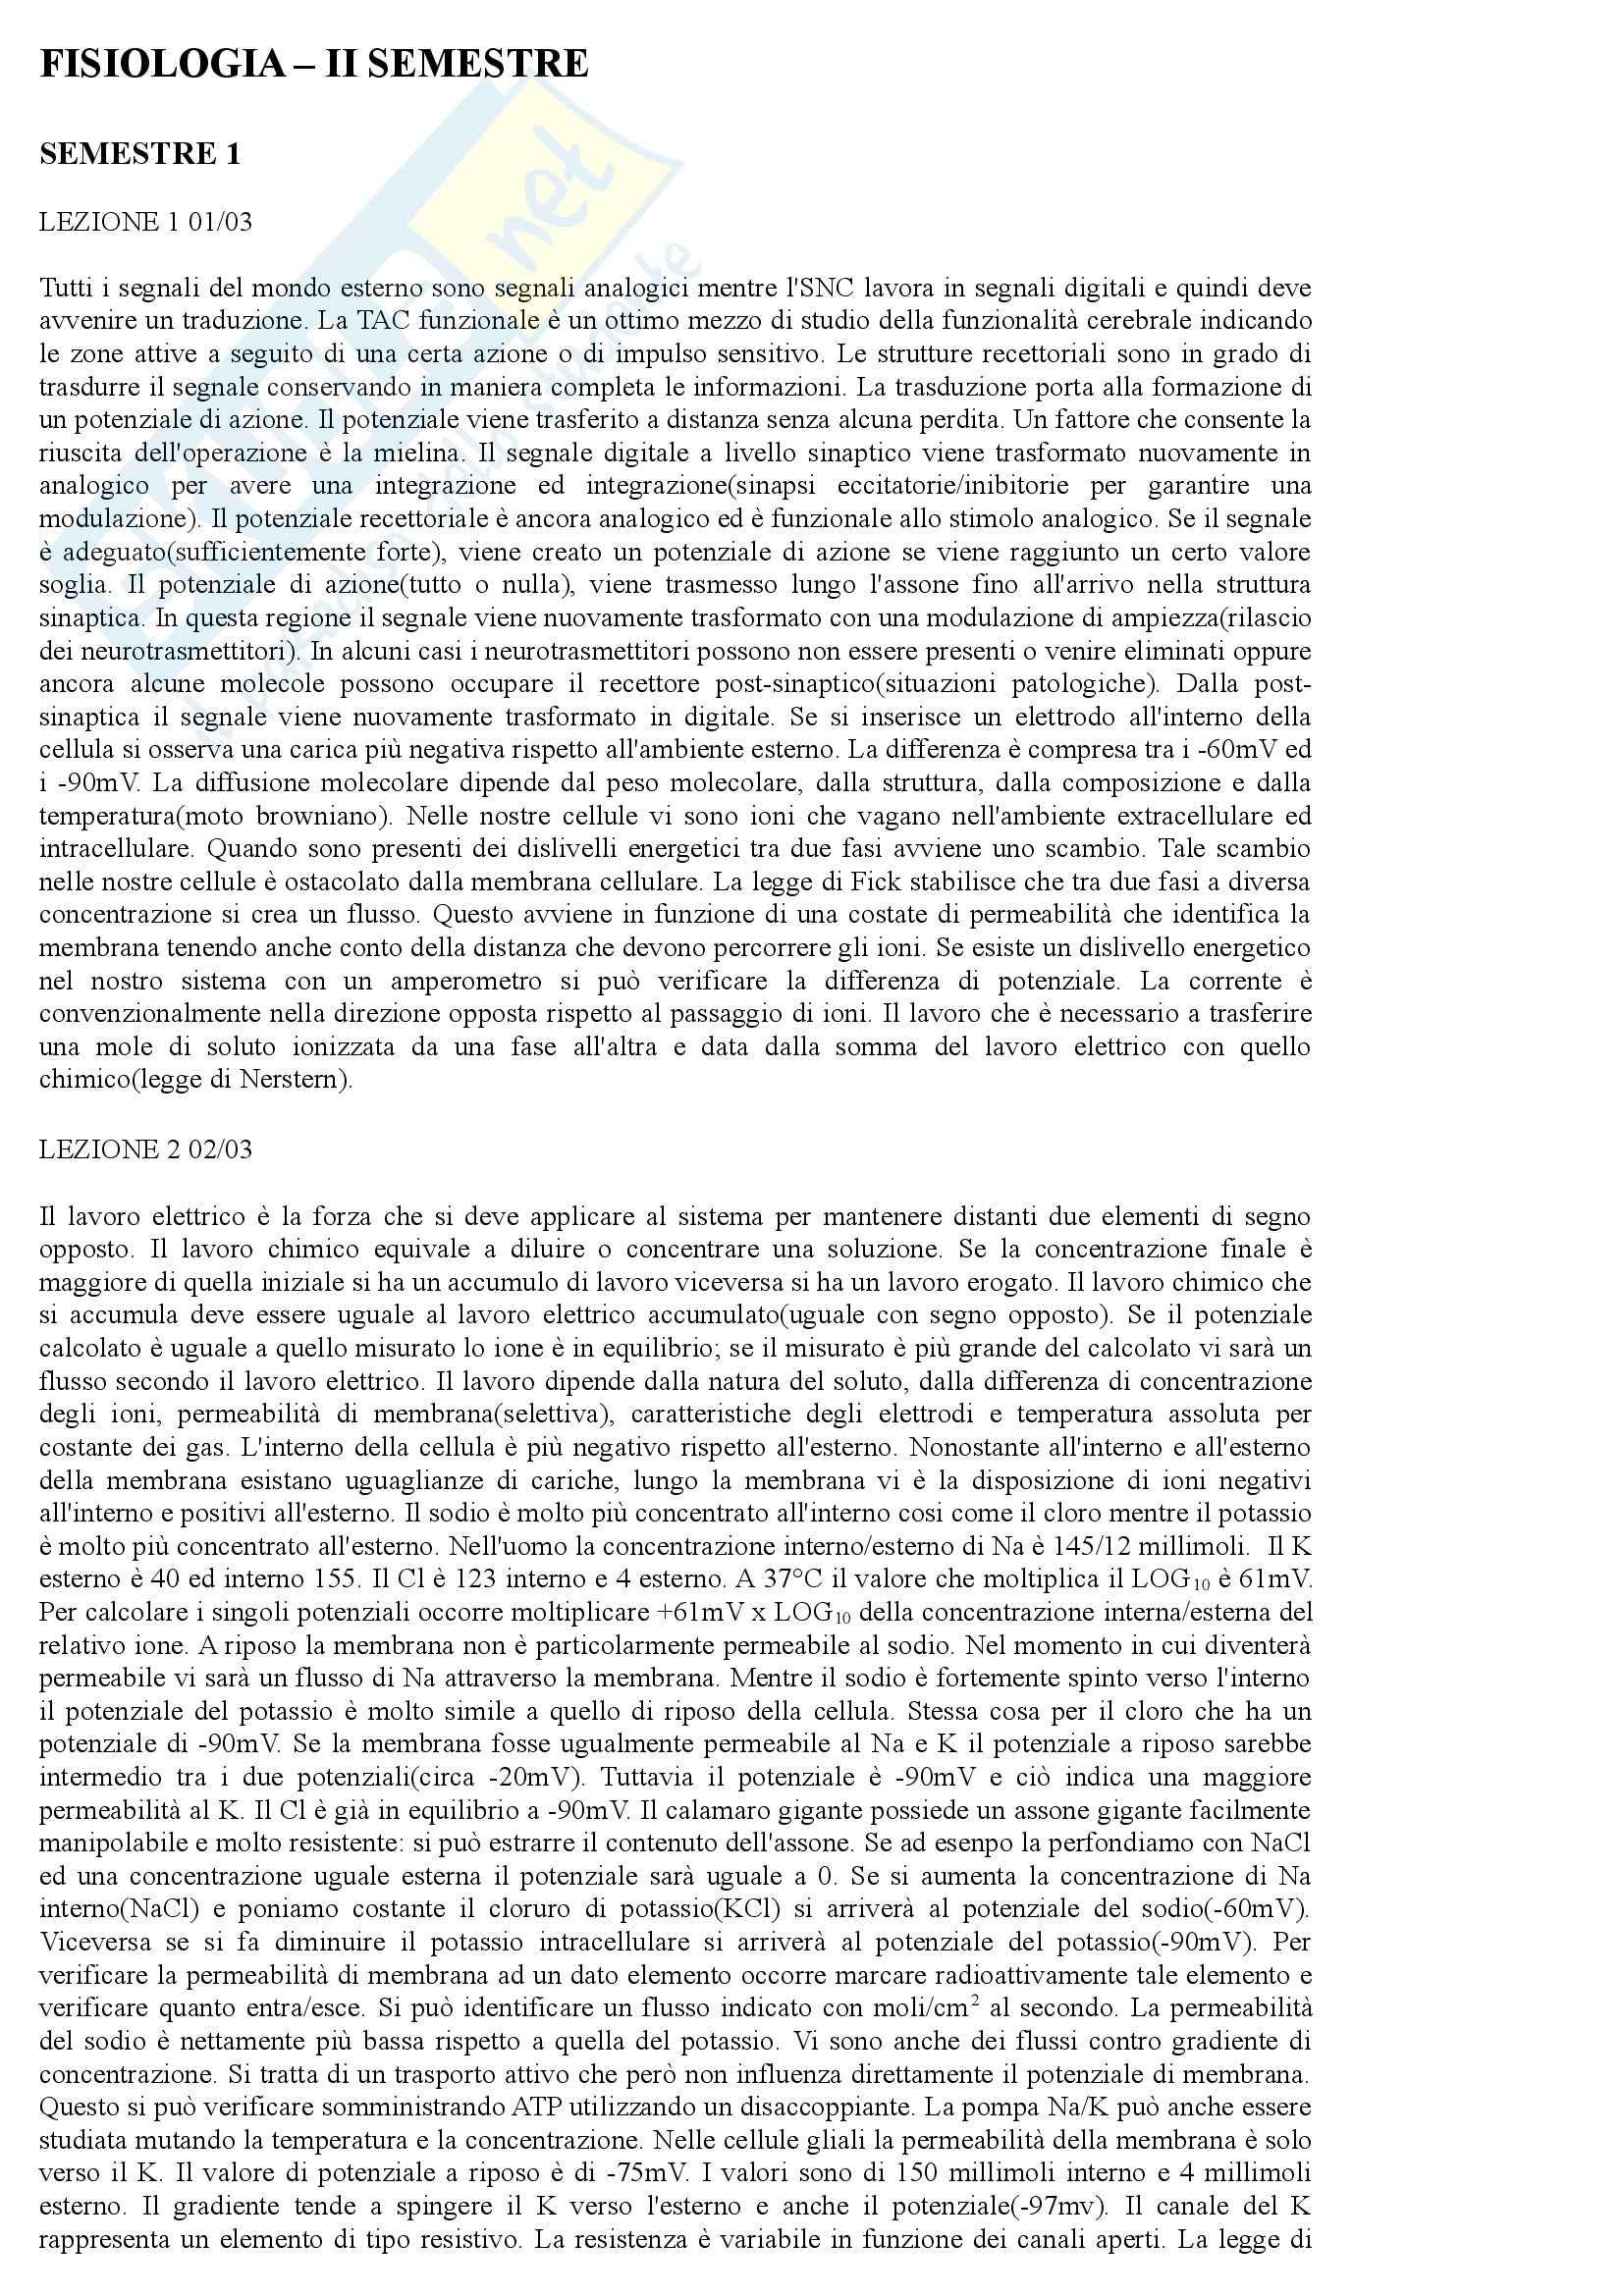 Fisiologia umana - Appunti